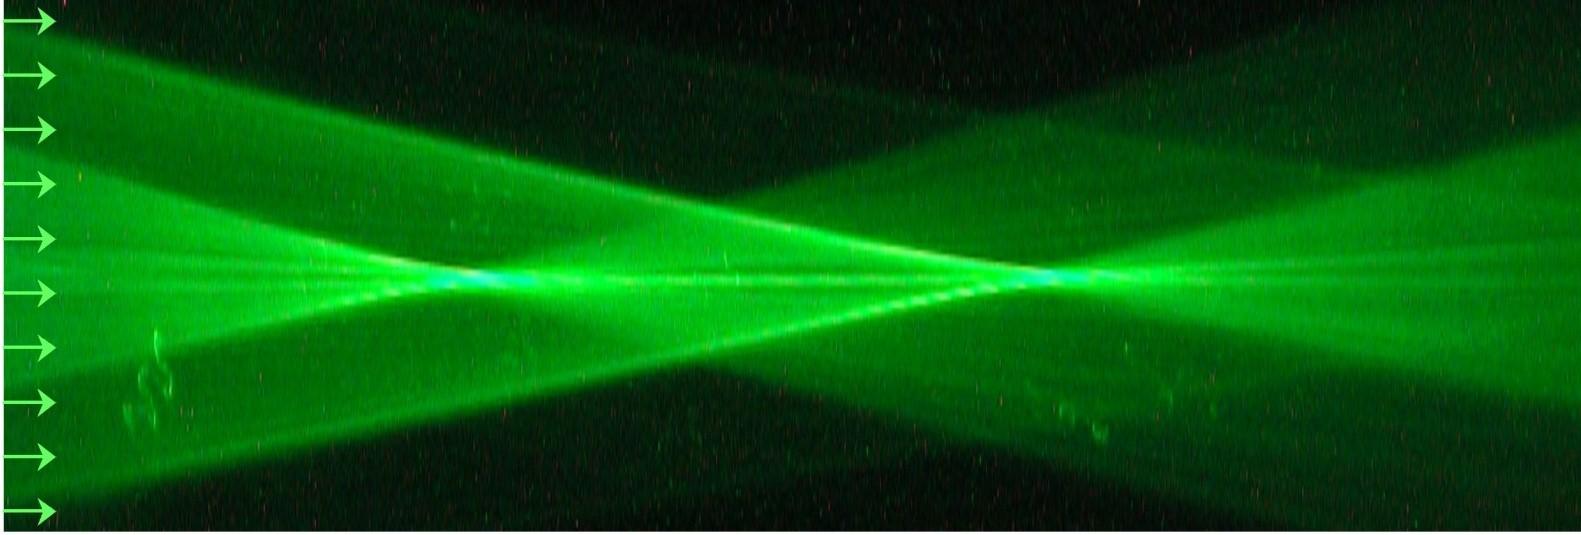 centre-ophtalmologie-la-ciotat-docteur-jerome-madar-chirurgie-refractive-au-laser-excimer-09